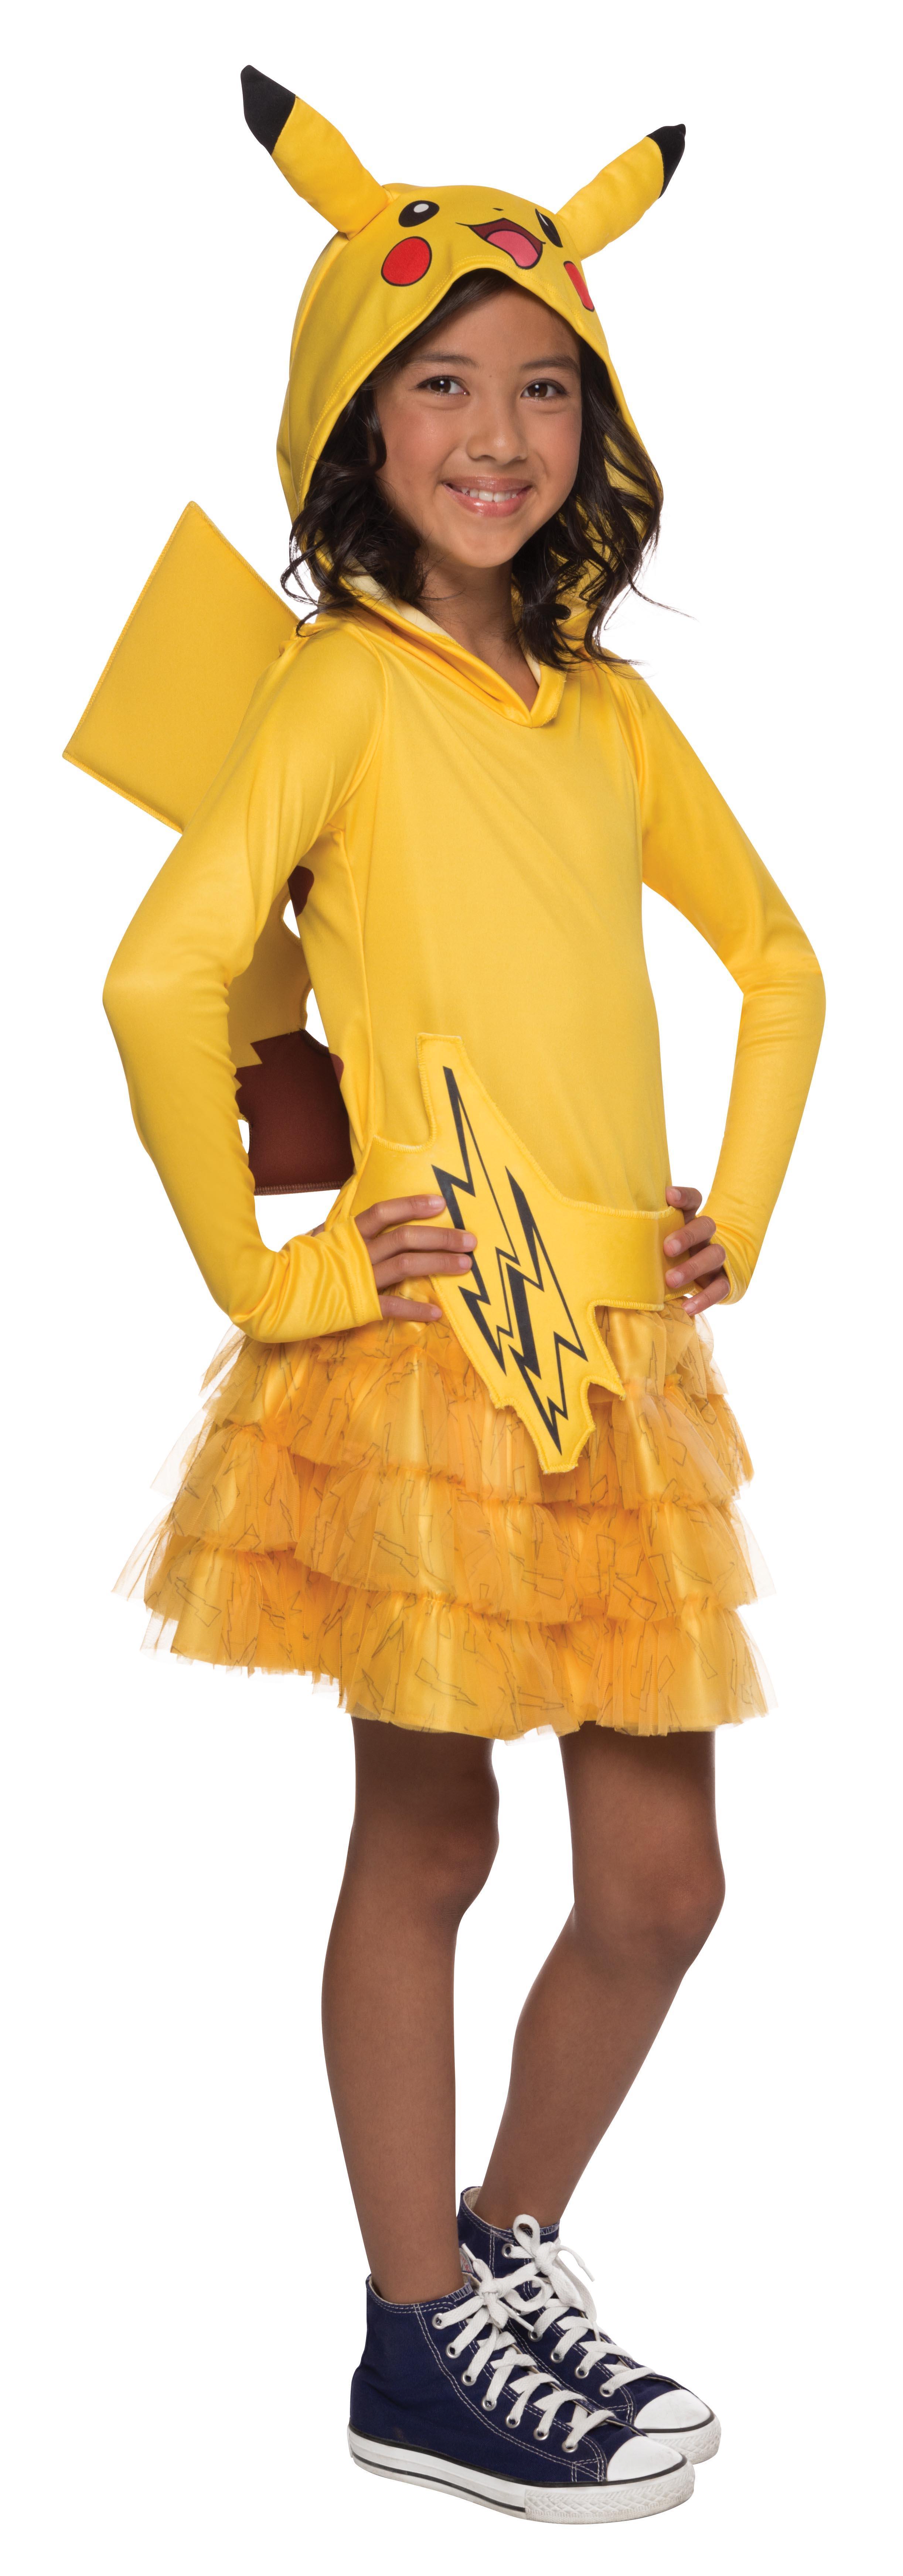 Childu0027s Pikachu · Childu0027s Jigglypuff · Childu0027s Eevee · Childu0027s Charizard · Childu0027s Squirtle · Childu0027s Bulbasaur  sc 1 st  Amazon.com & Amazon.com: Rubies Pokemon Pikachu Toddler Jumpsuit Costume (Pikachu ...